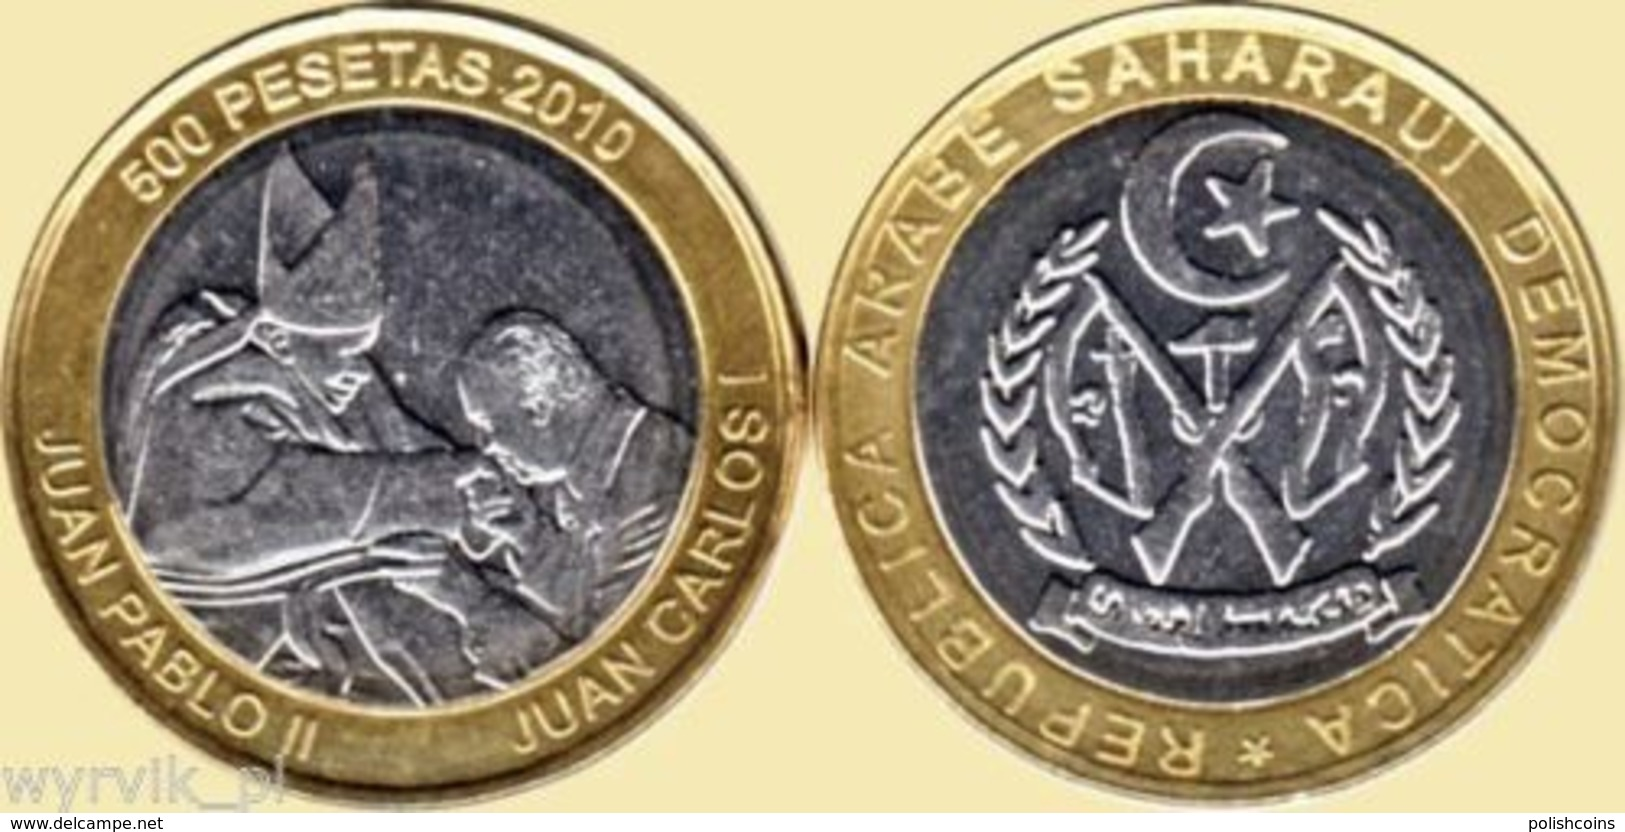 WEST SAHARA 2010 500 Pesetas John Paul II JP2 UNC Arabe Saharui Sahara Zachodnia - Western Sahara